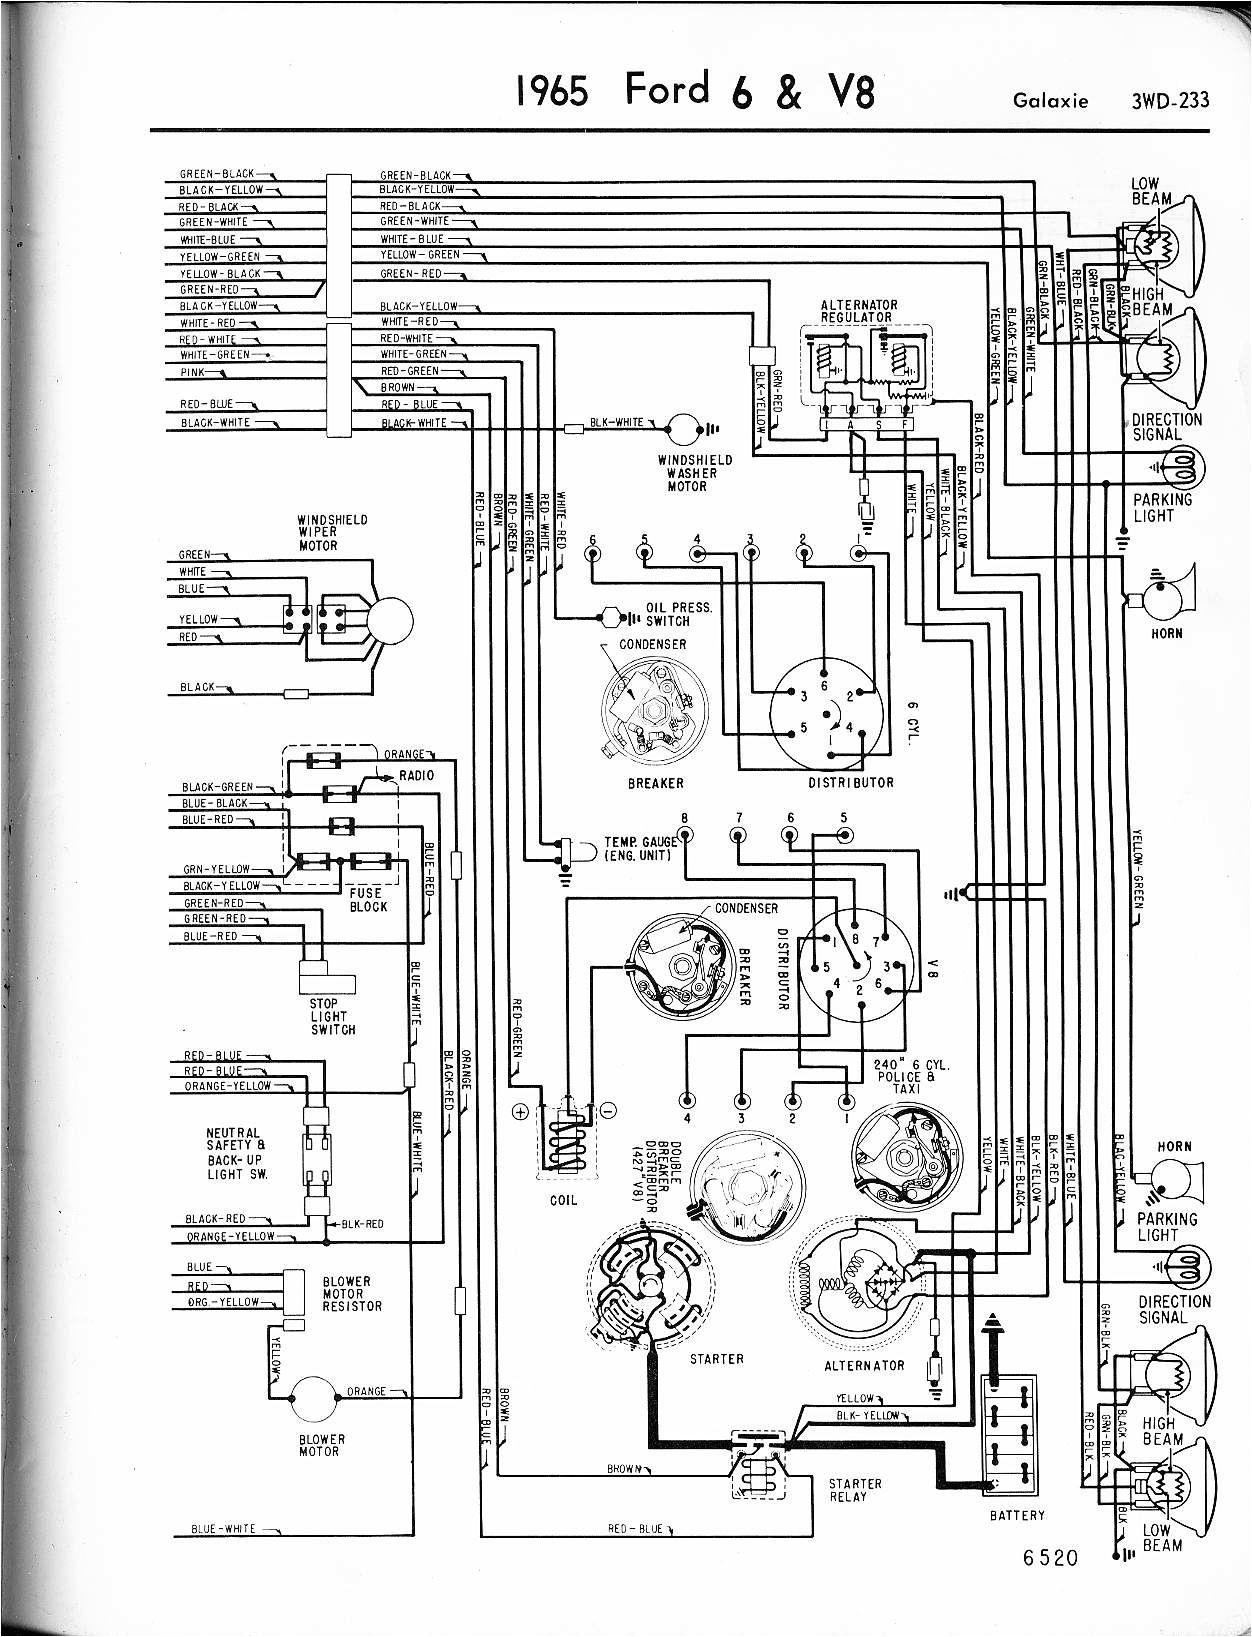 free wiring diagrams automotive ford galaxie 1965 6 v8 galaxie 1965 ford mustang dash wiring diagram 1965 ford wiring diagram